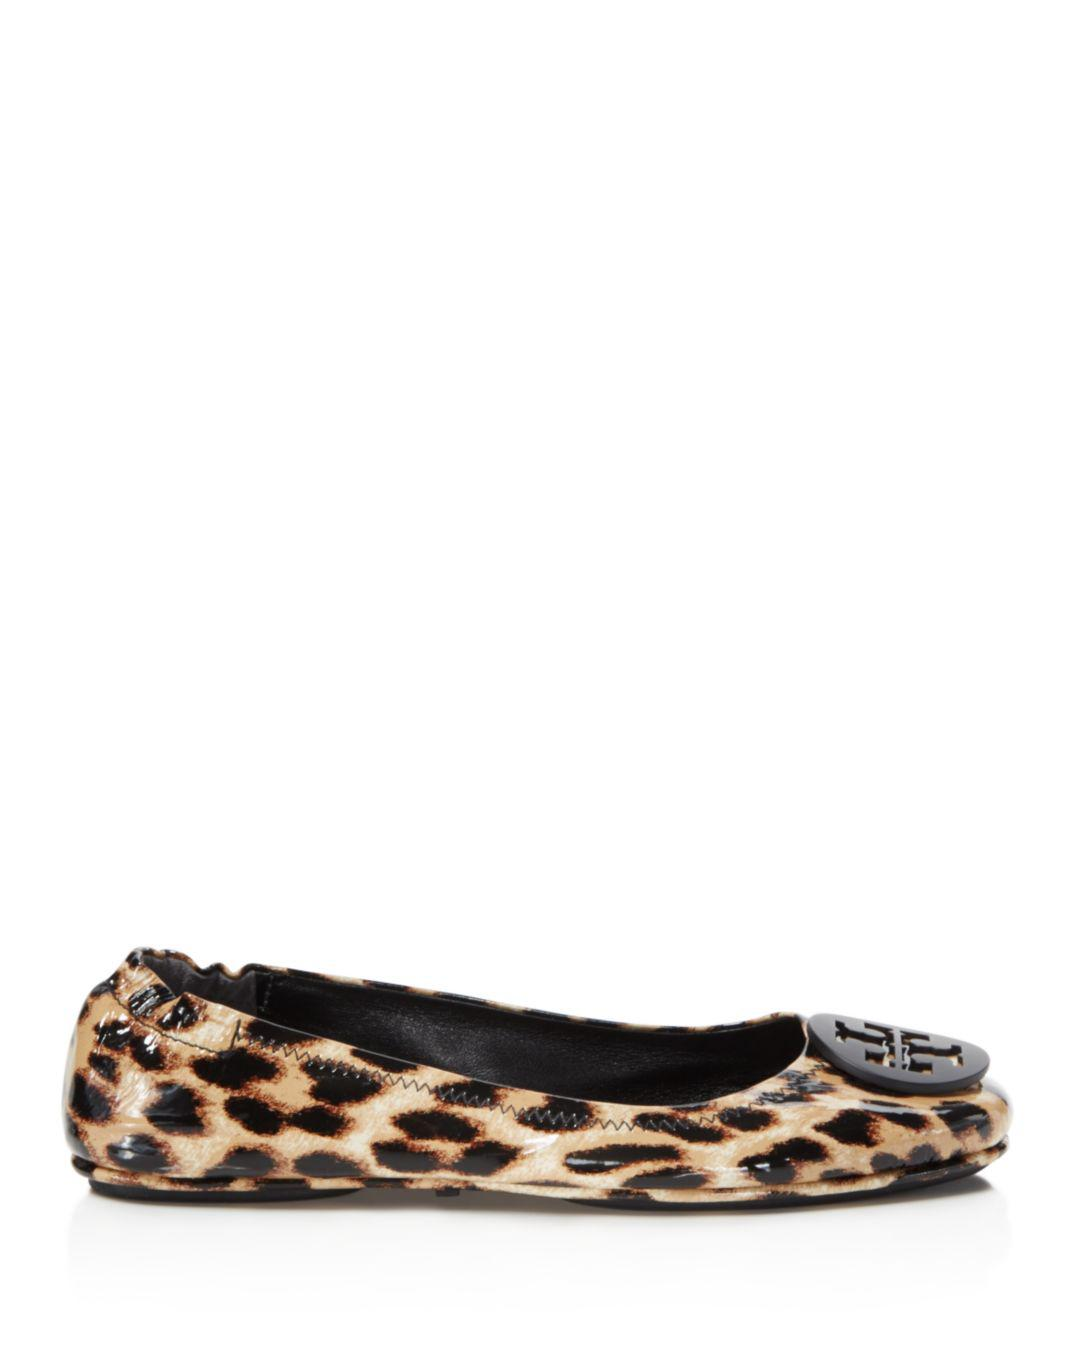 1fda11bd655 Lyst - Tory Burch Minnie Leopard Print Patent Leather Travel Ballet Flat